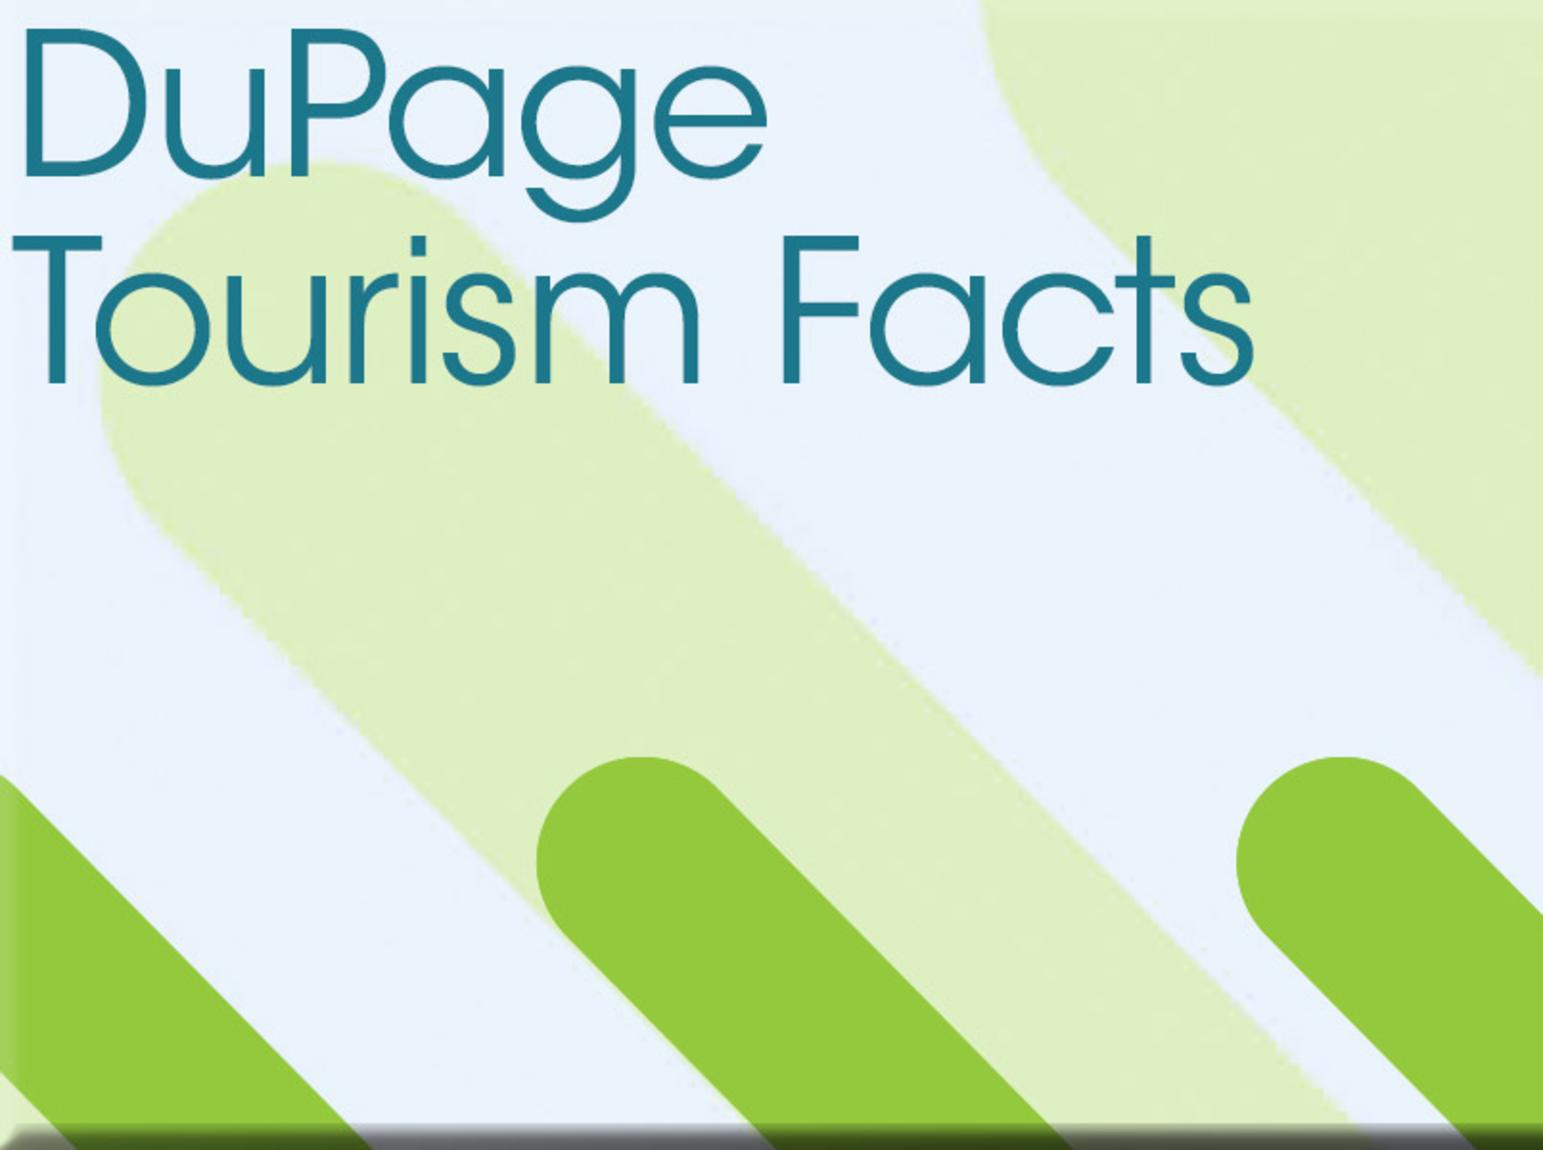 DuPage Tourism Facts